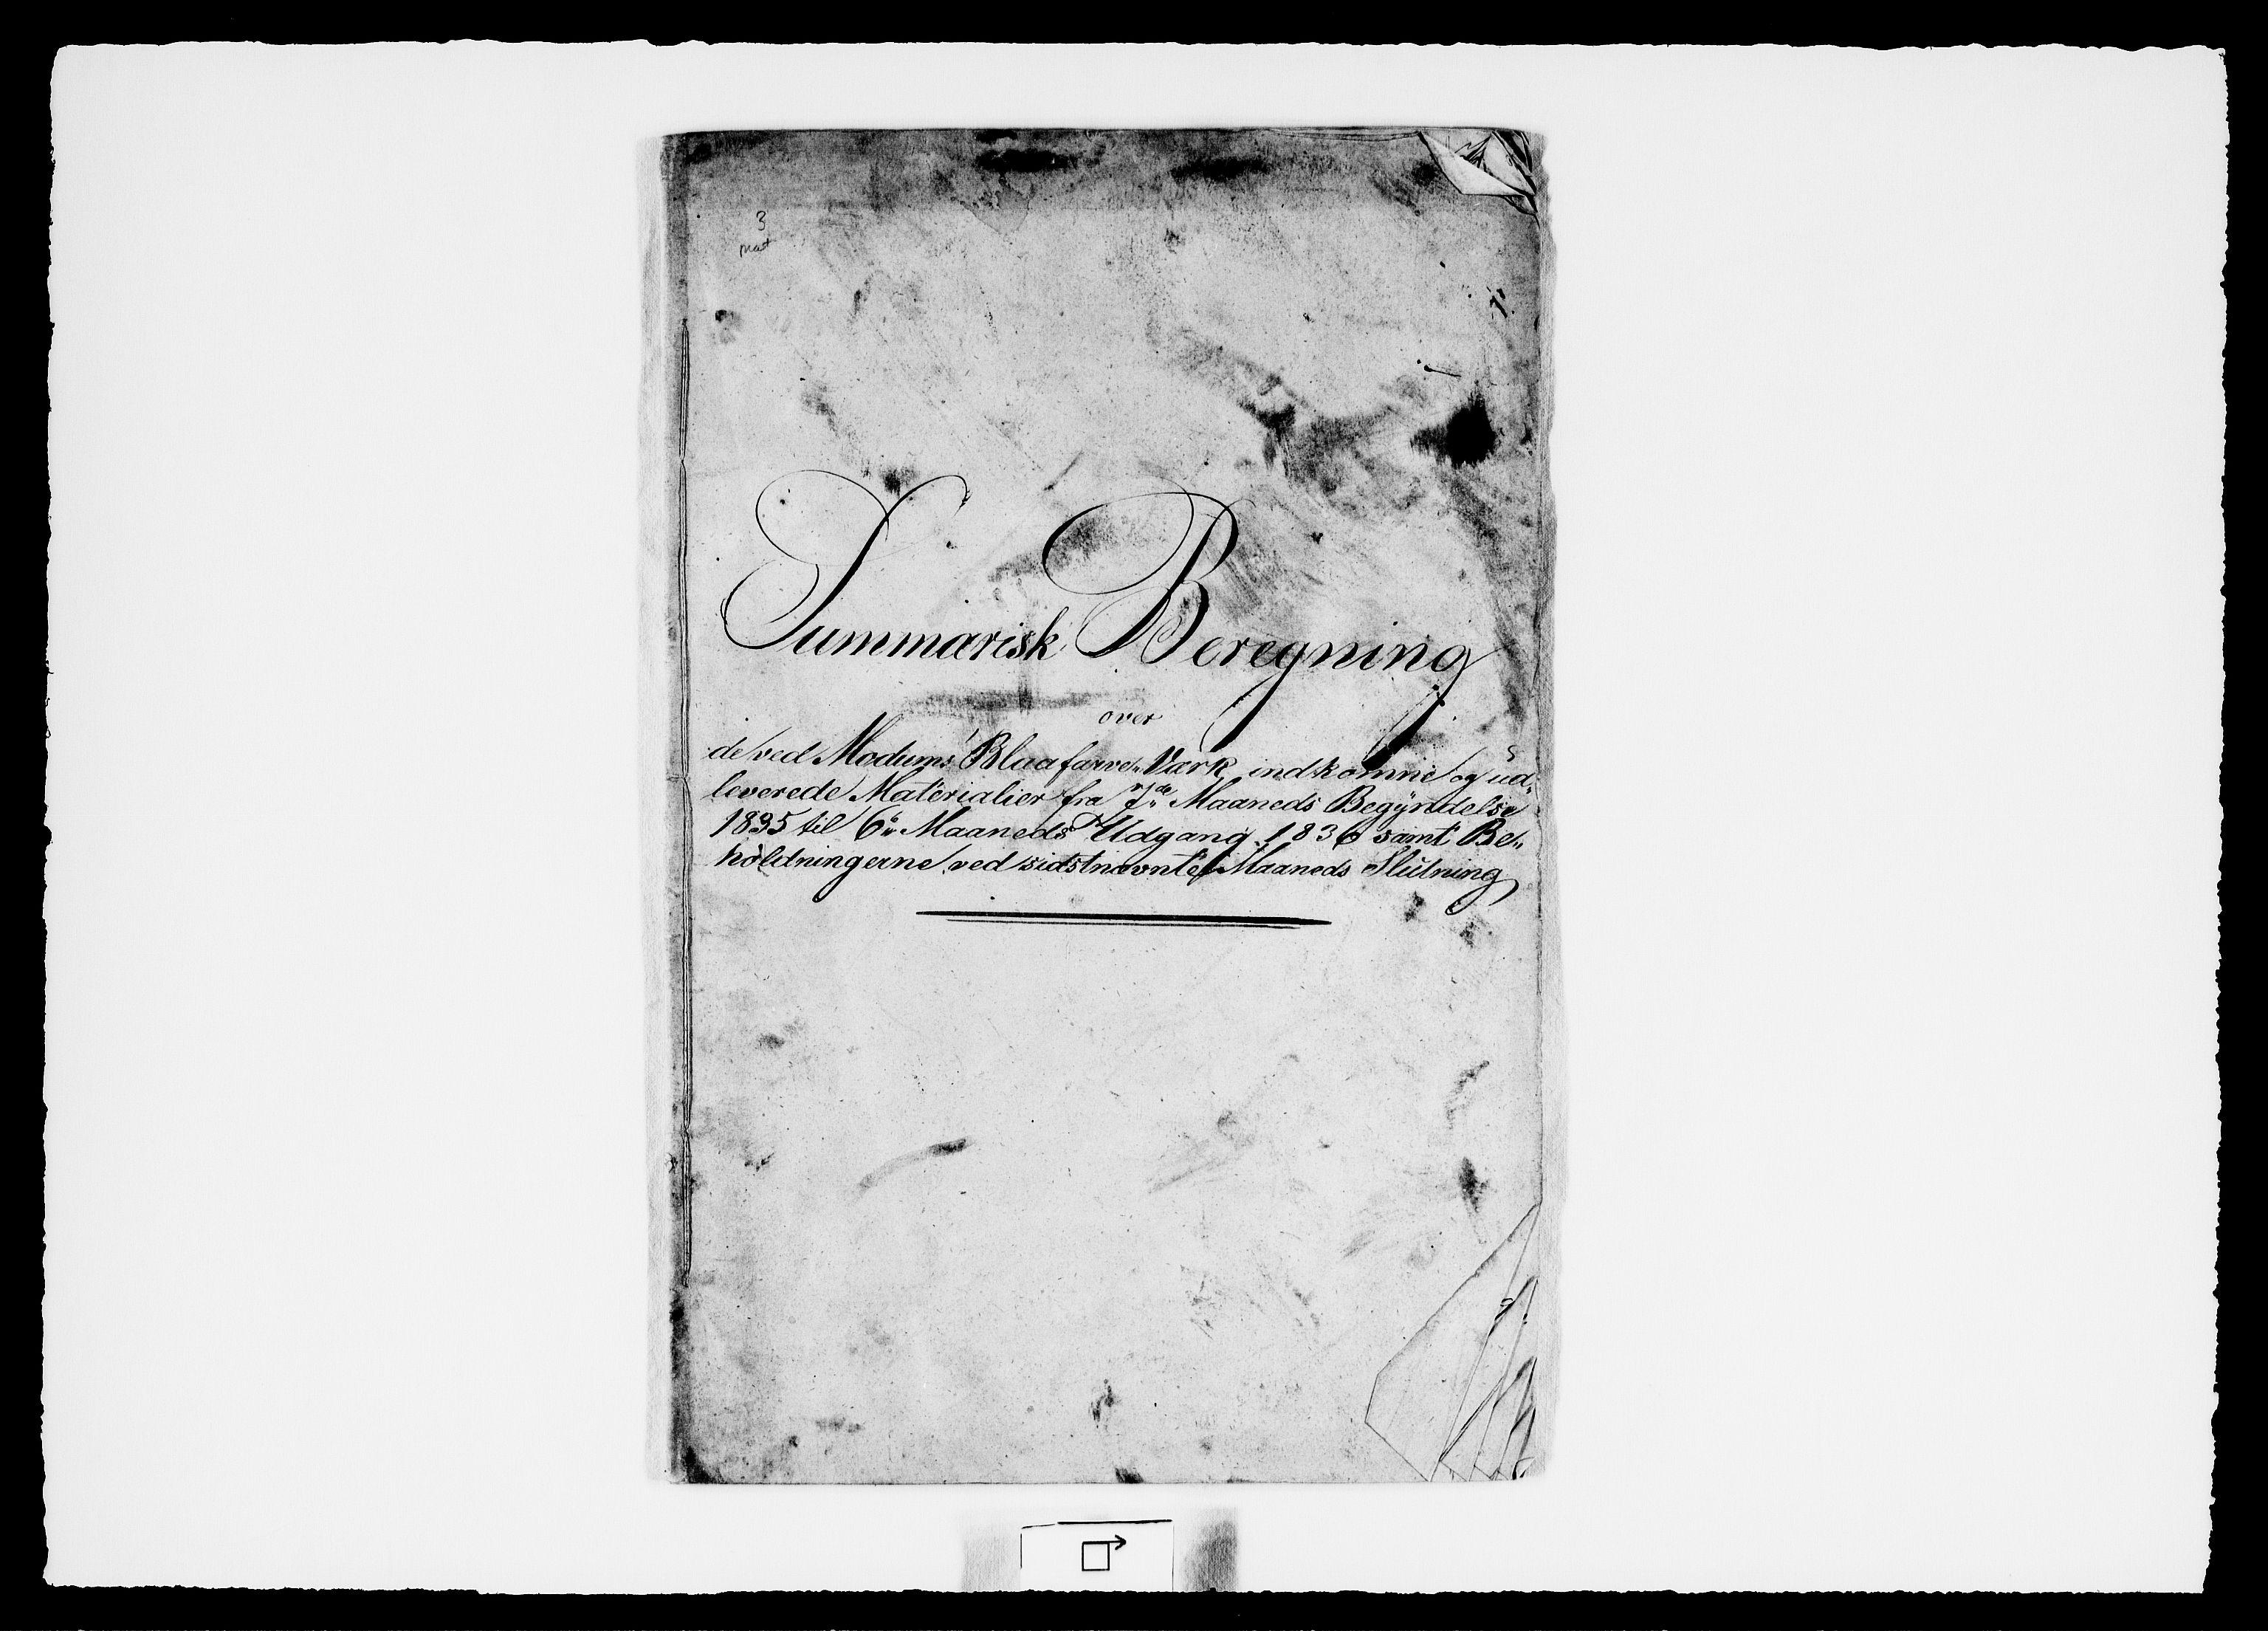 RA, Modums Blaafarveværk, G/Gd/Gdd/L0248, 1836-1839, s. 2